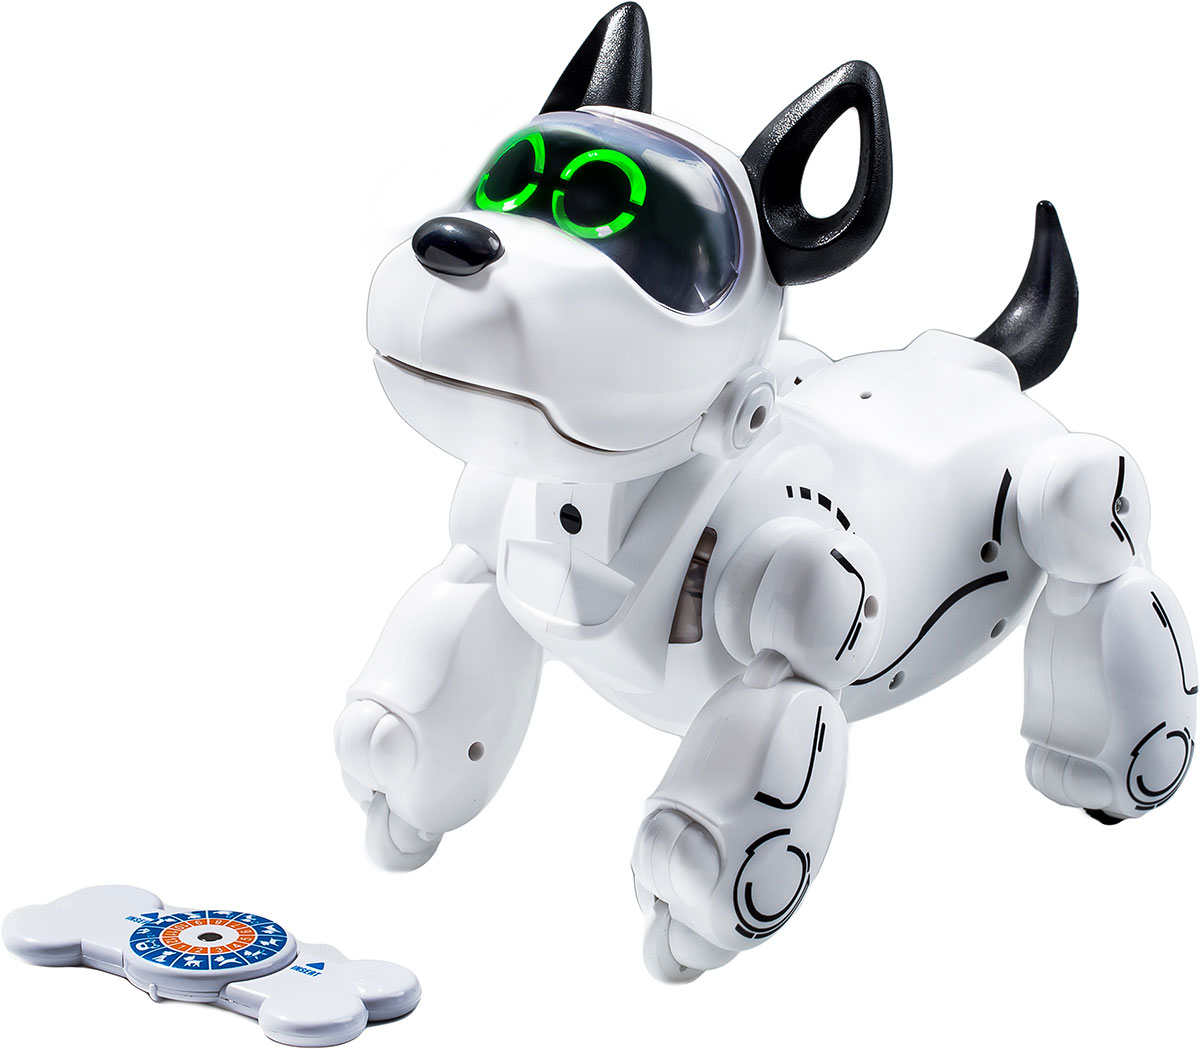 Silverlit Интерактивная игрушка Робот PupBo игрушка silverlit щенок золотистый ретривер 88481s